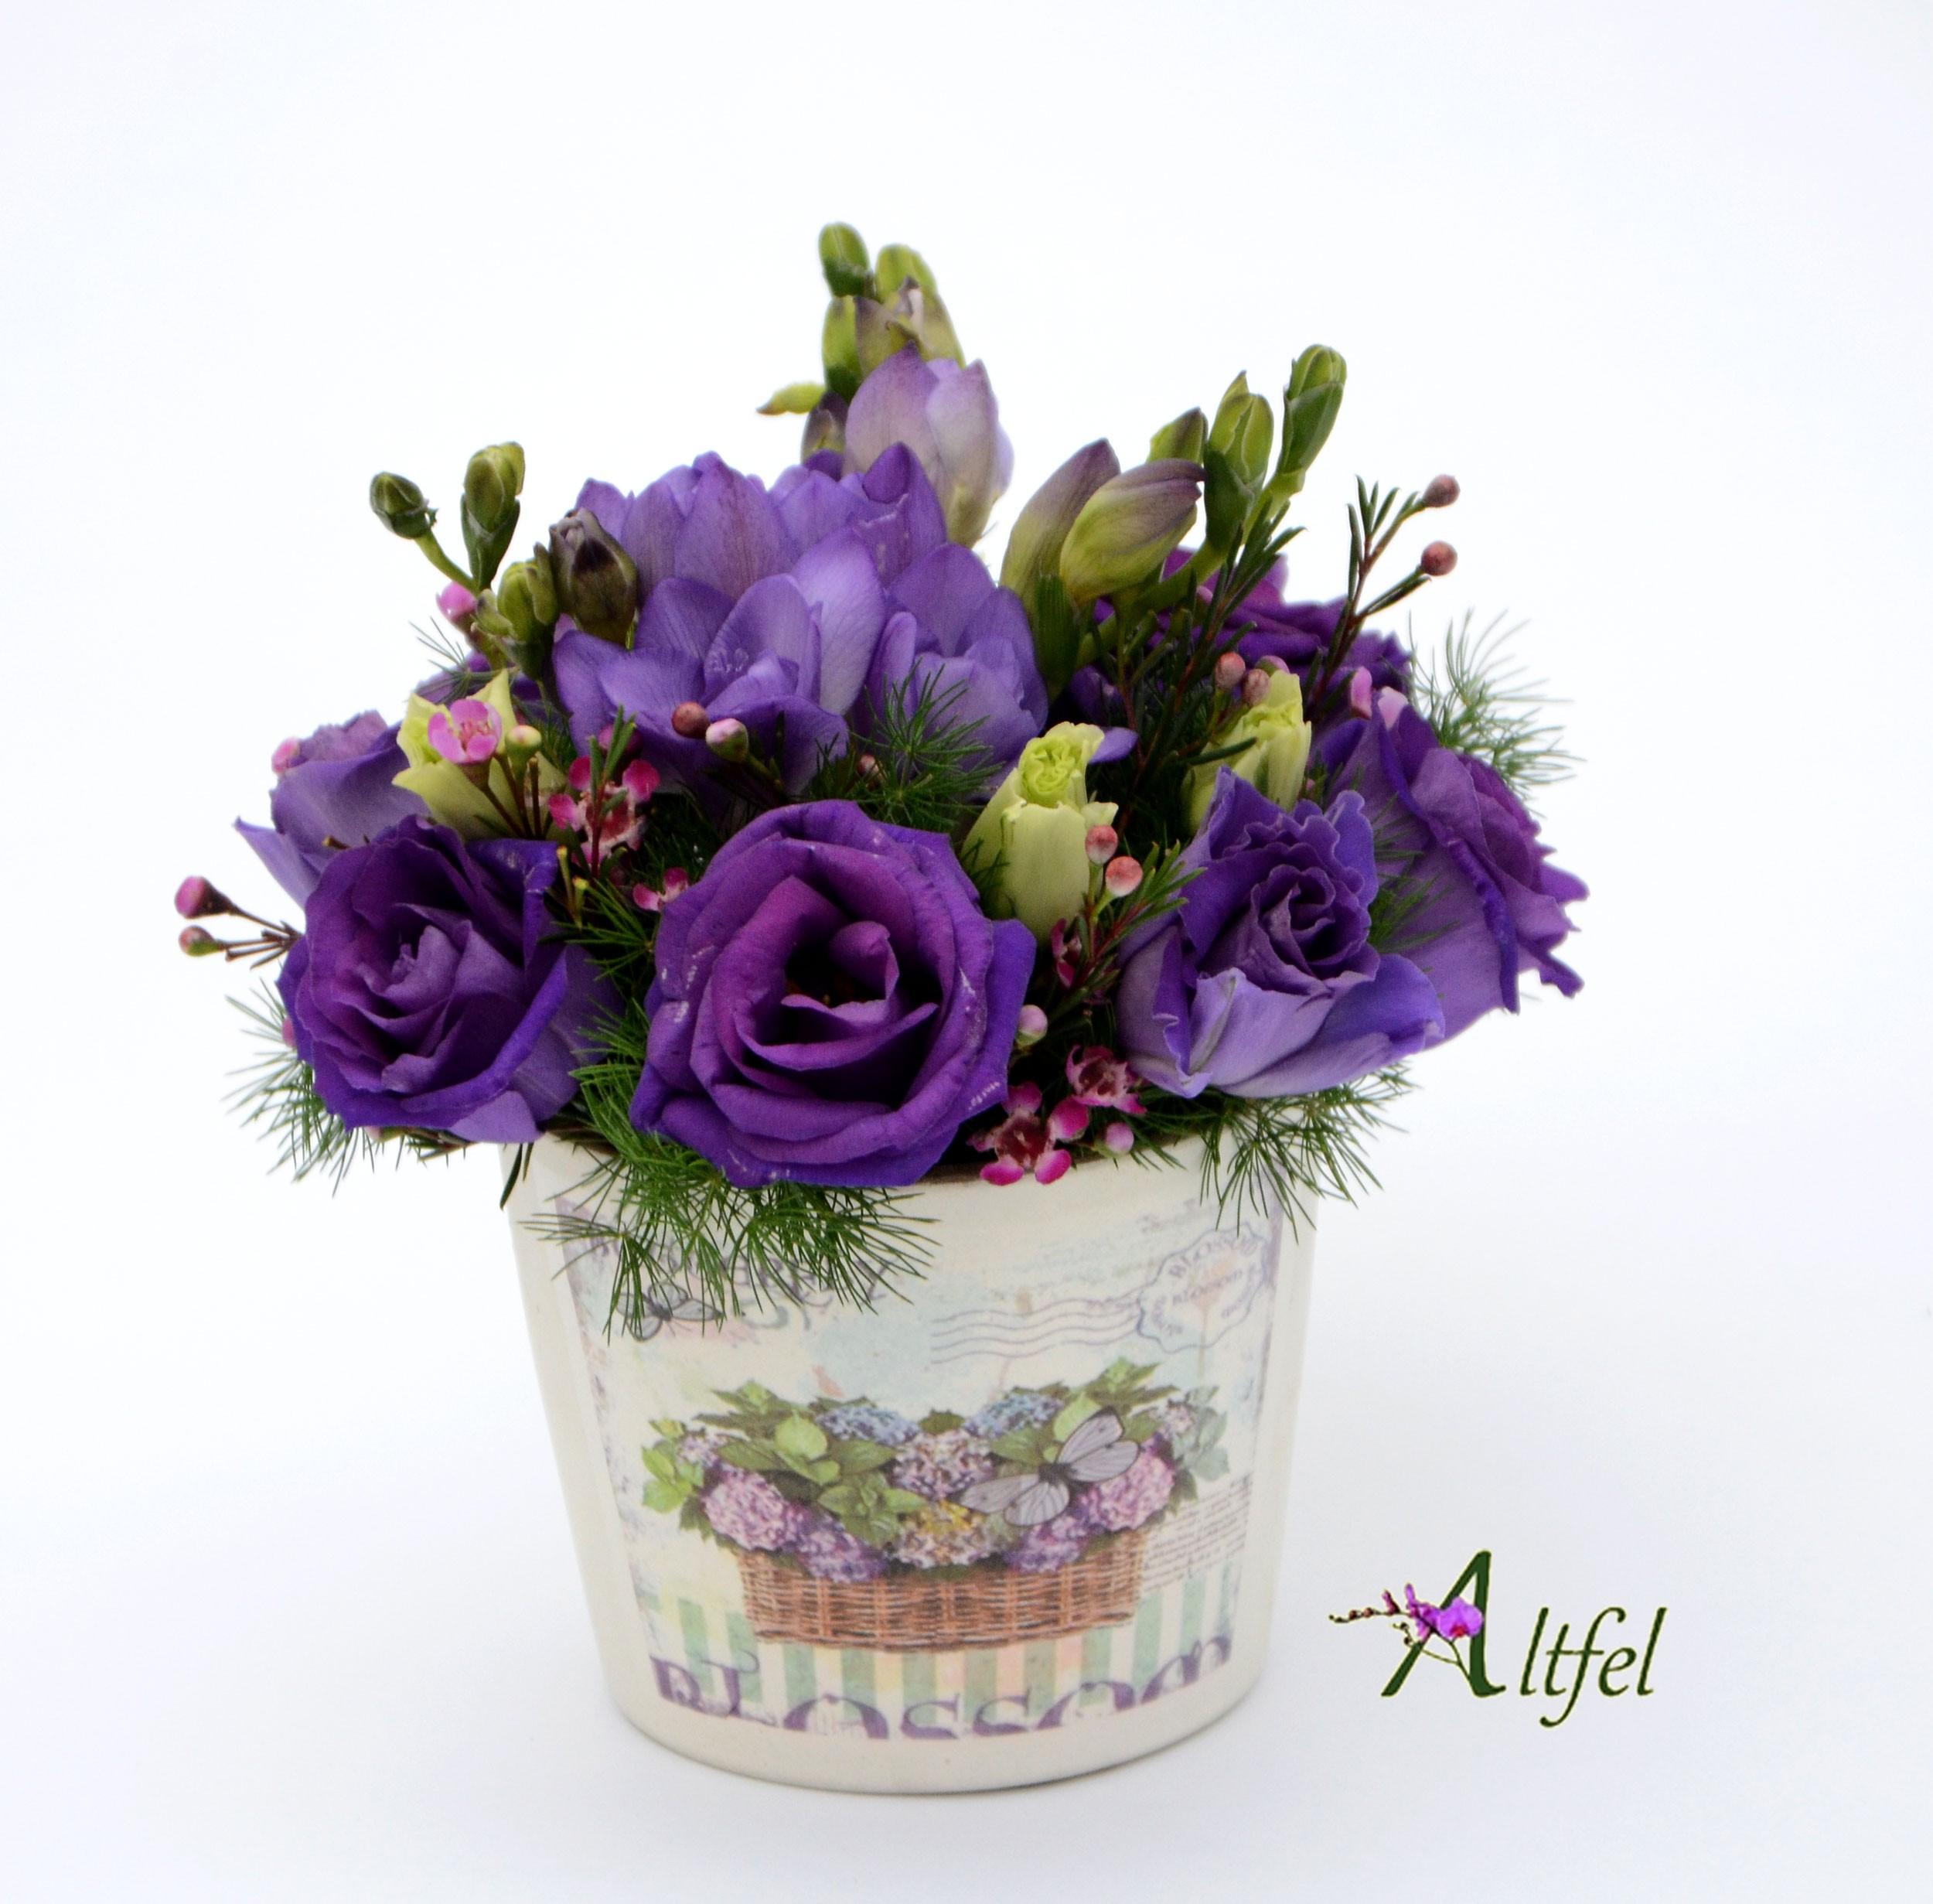 Set 10 Aranjamente Florale Martisor Violet Flori 1 8 Martie